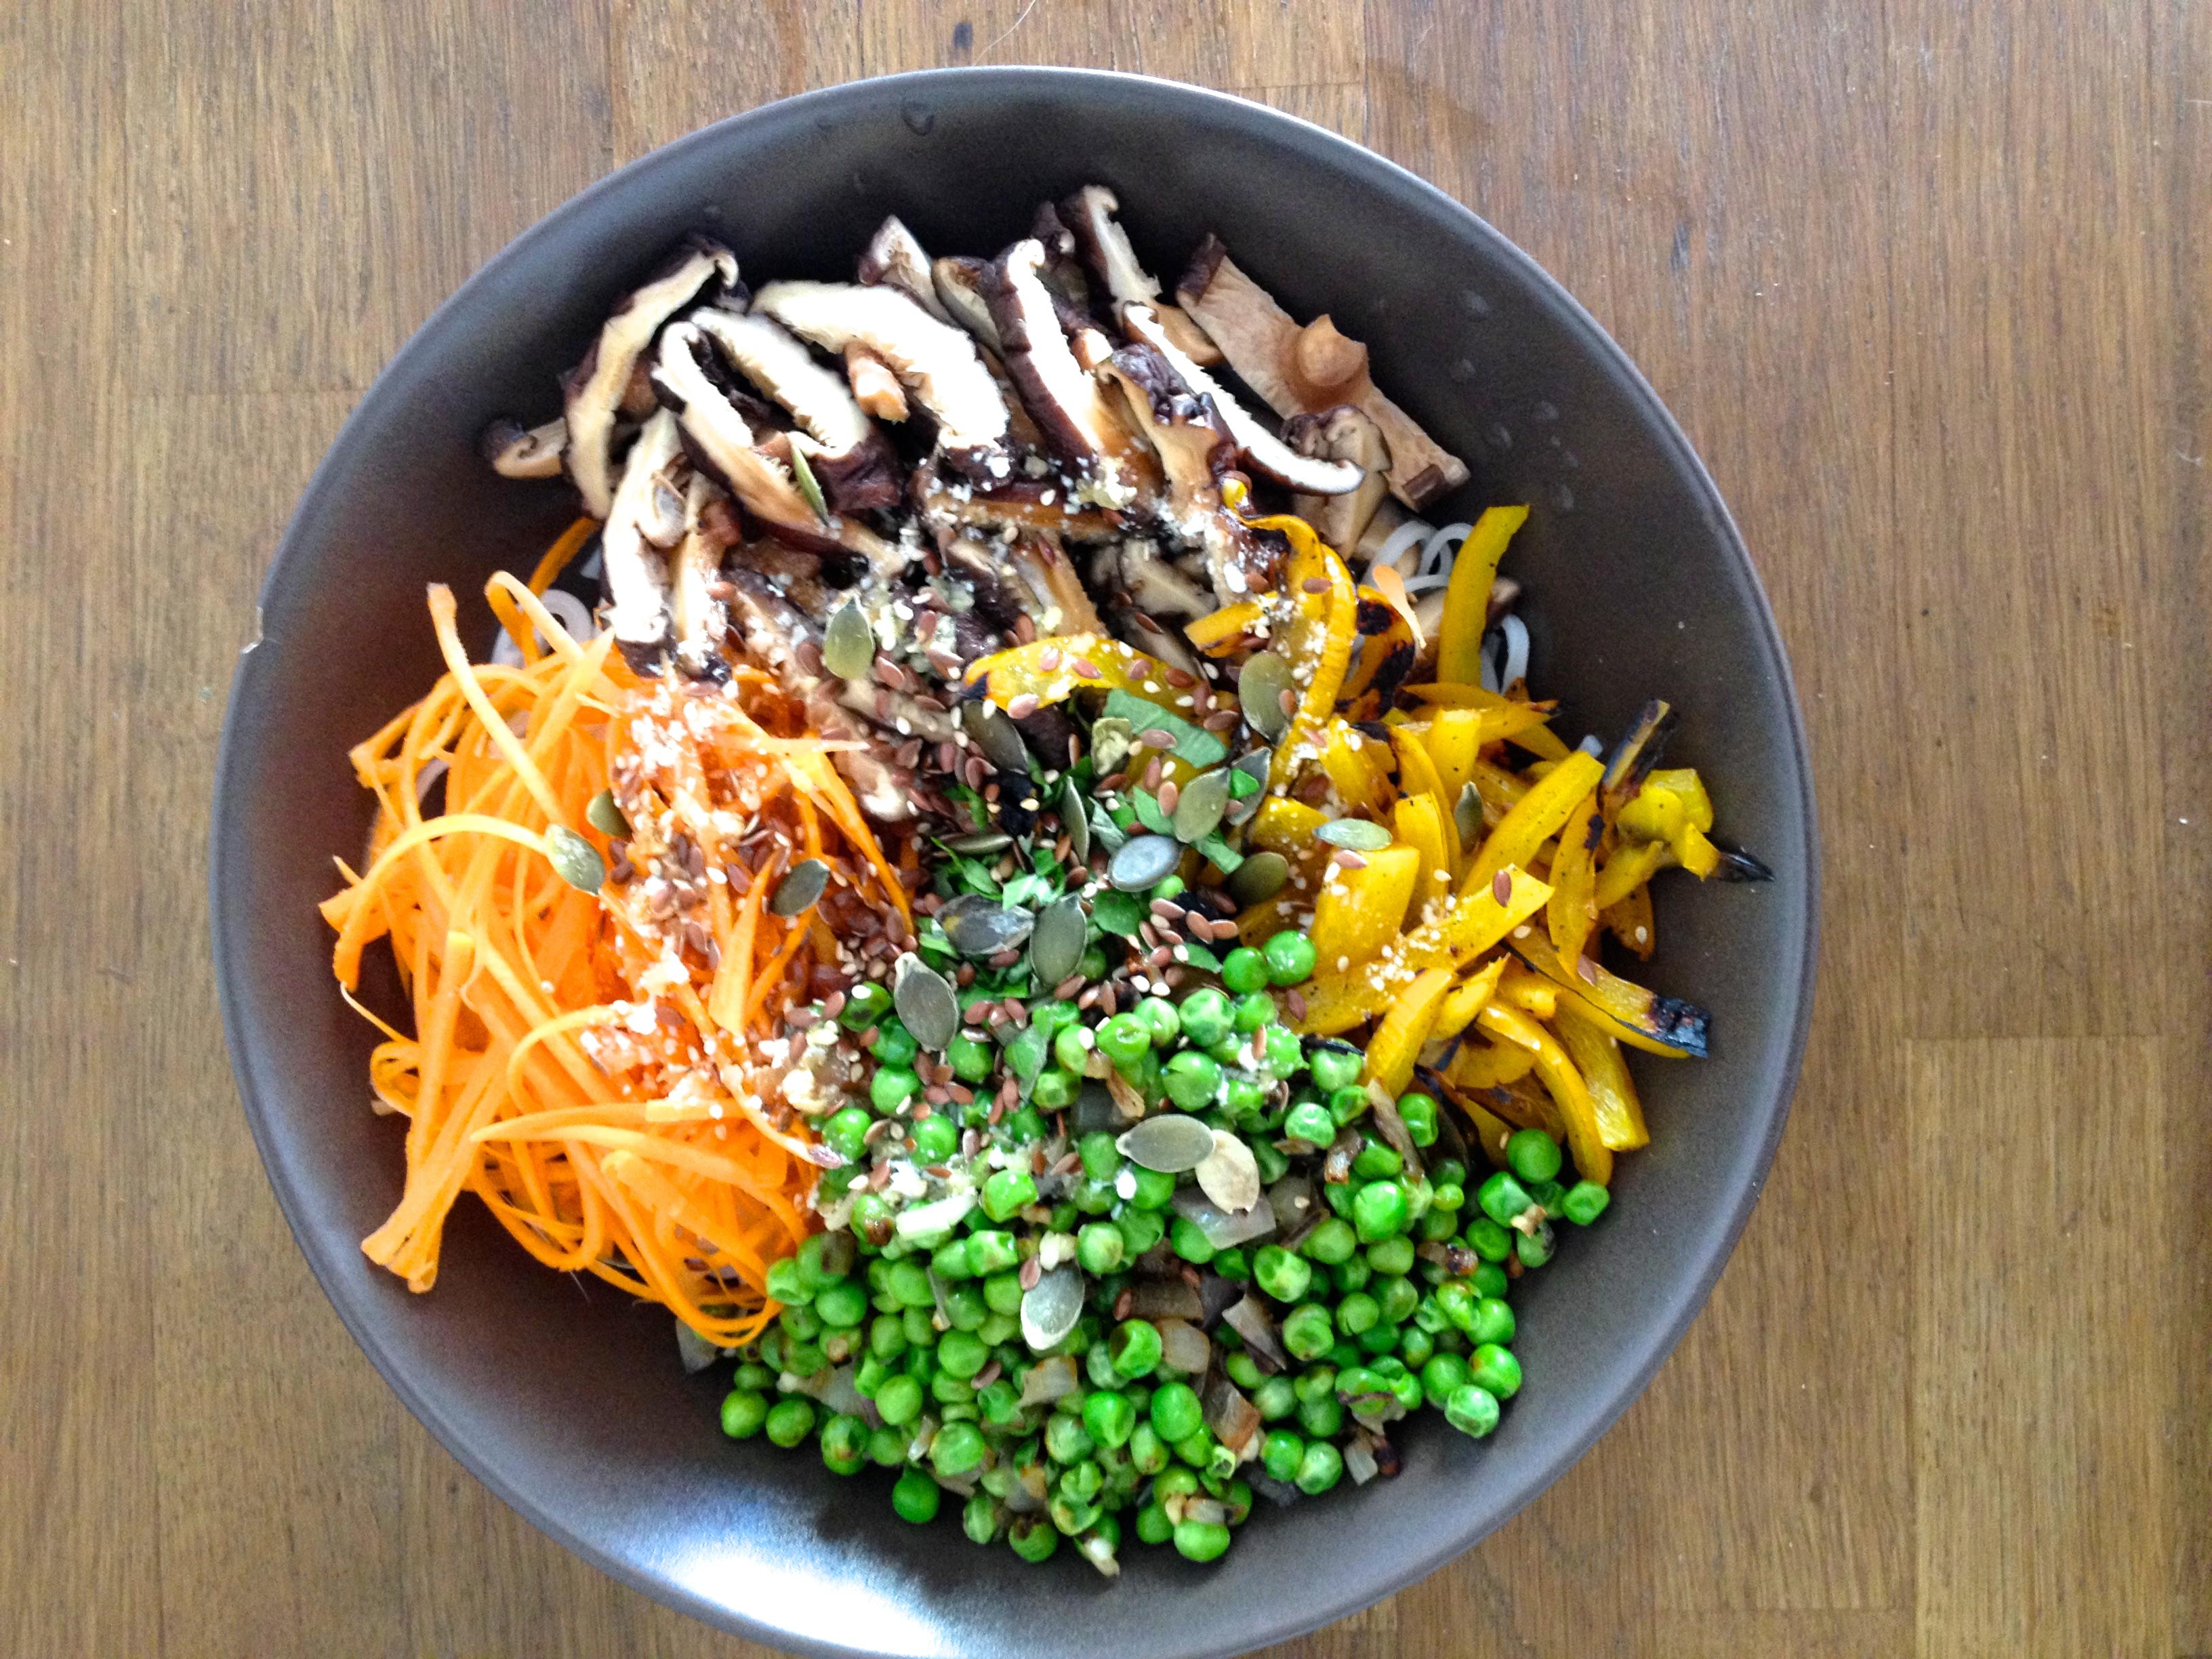 vegan noodles carottes champignons poivrons petits pois allure green. Black Bedroom Furniture Sets. Home Design Ideas